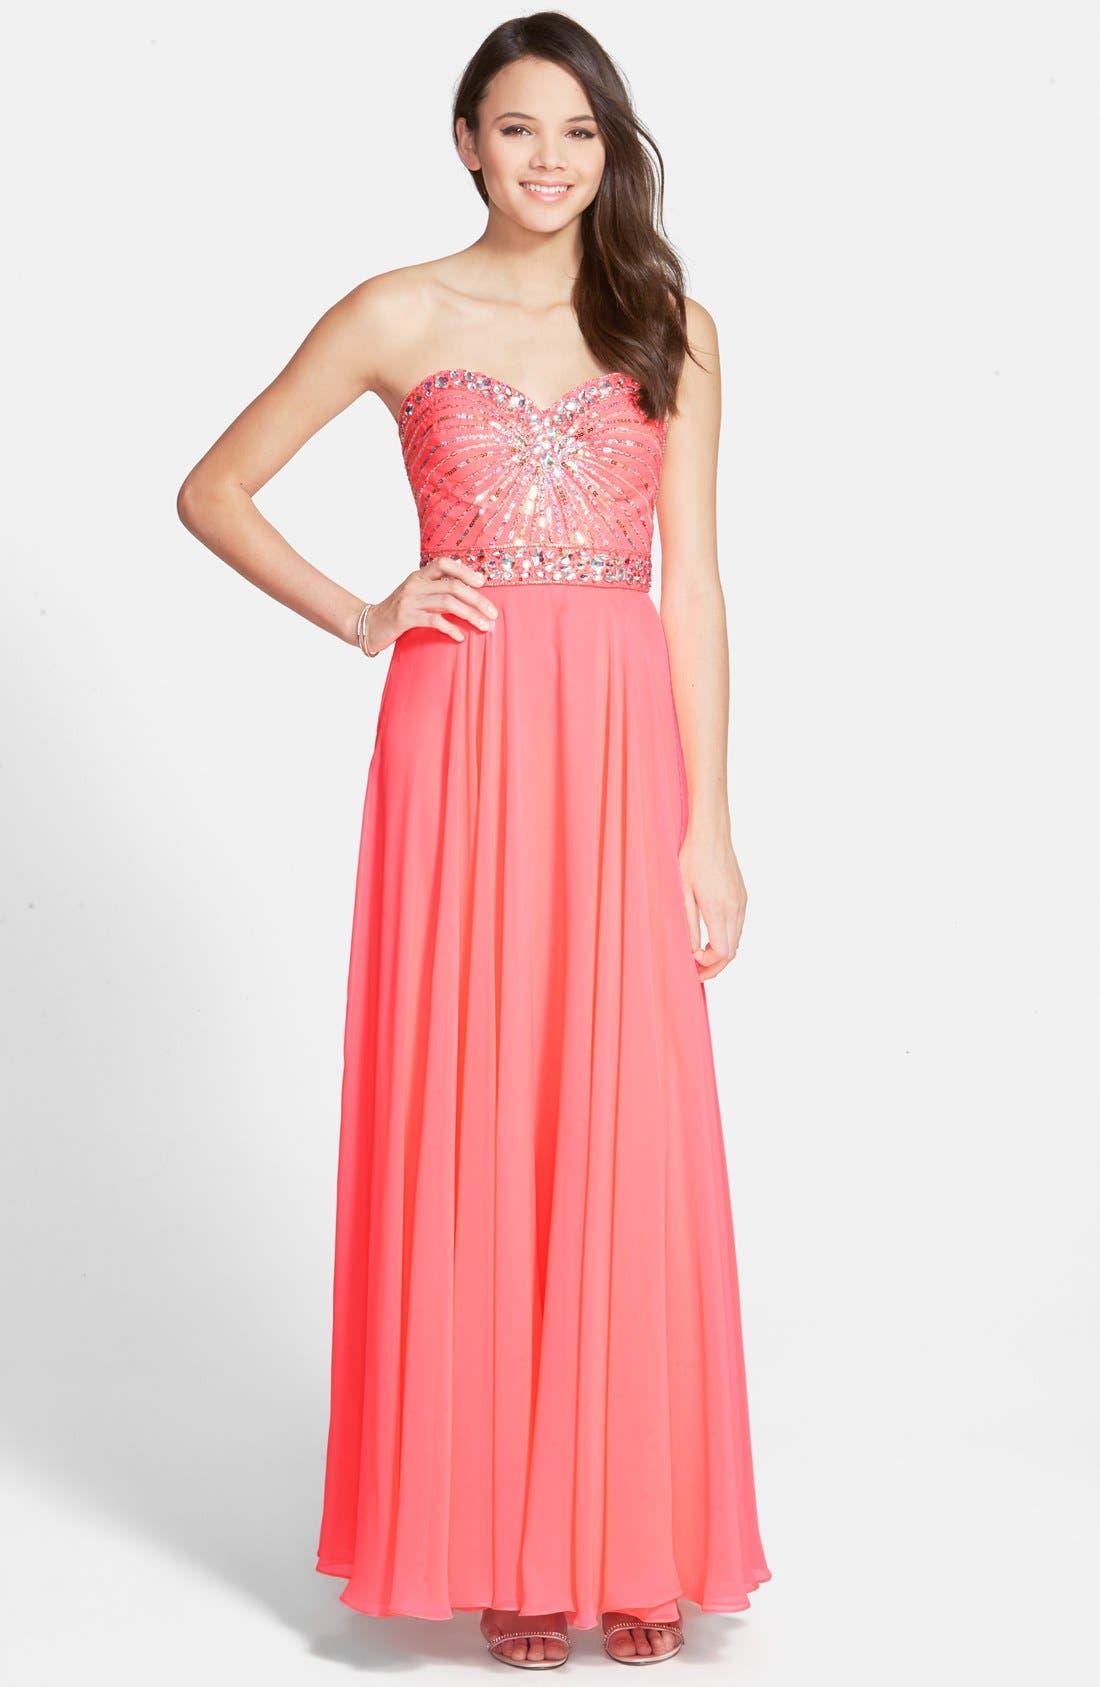 Alternate Image 1 Selected - Xscape Embellished Chiffon Gown